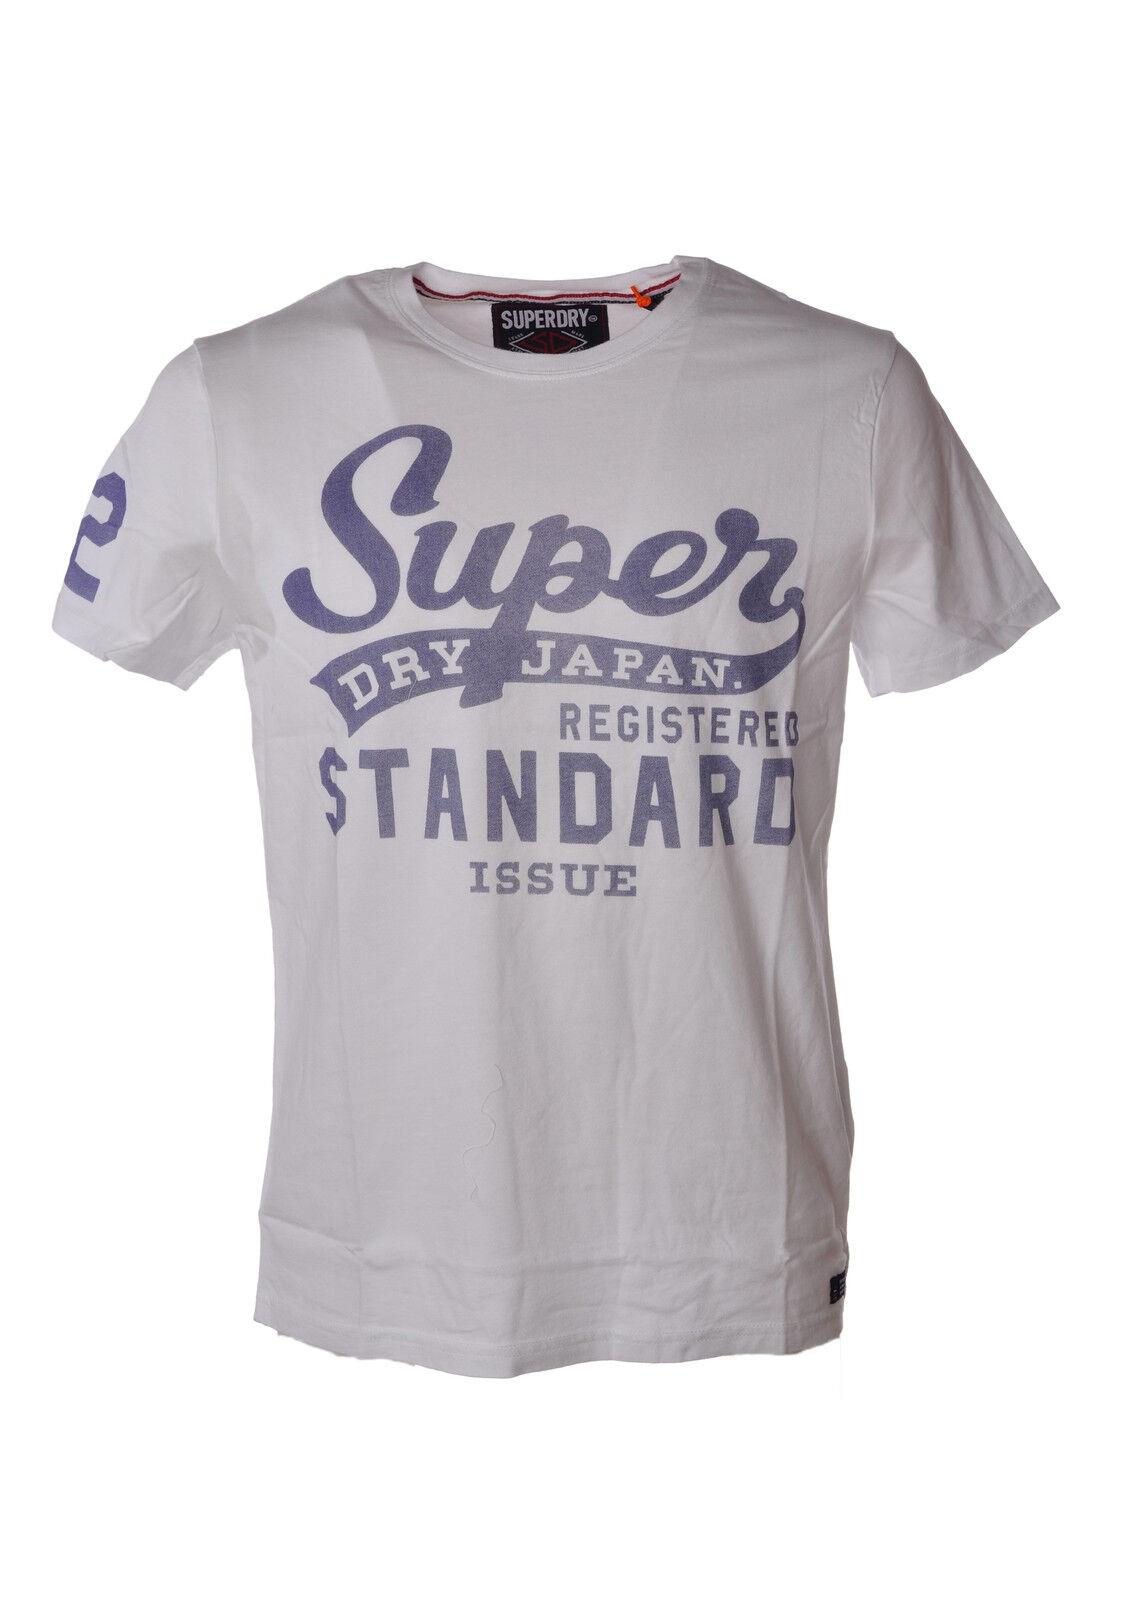 Superdry - Topwear-T-shirts - Man - Weiß - 3479222B183814